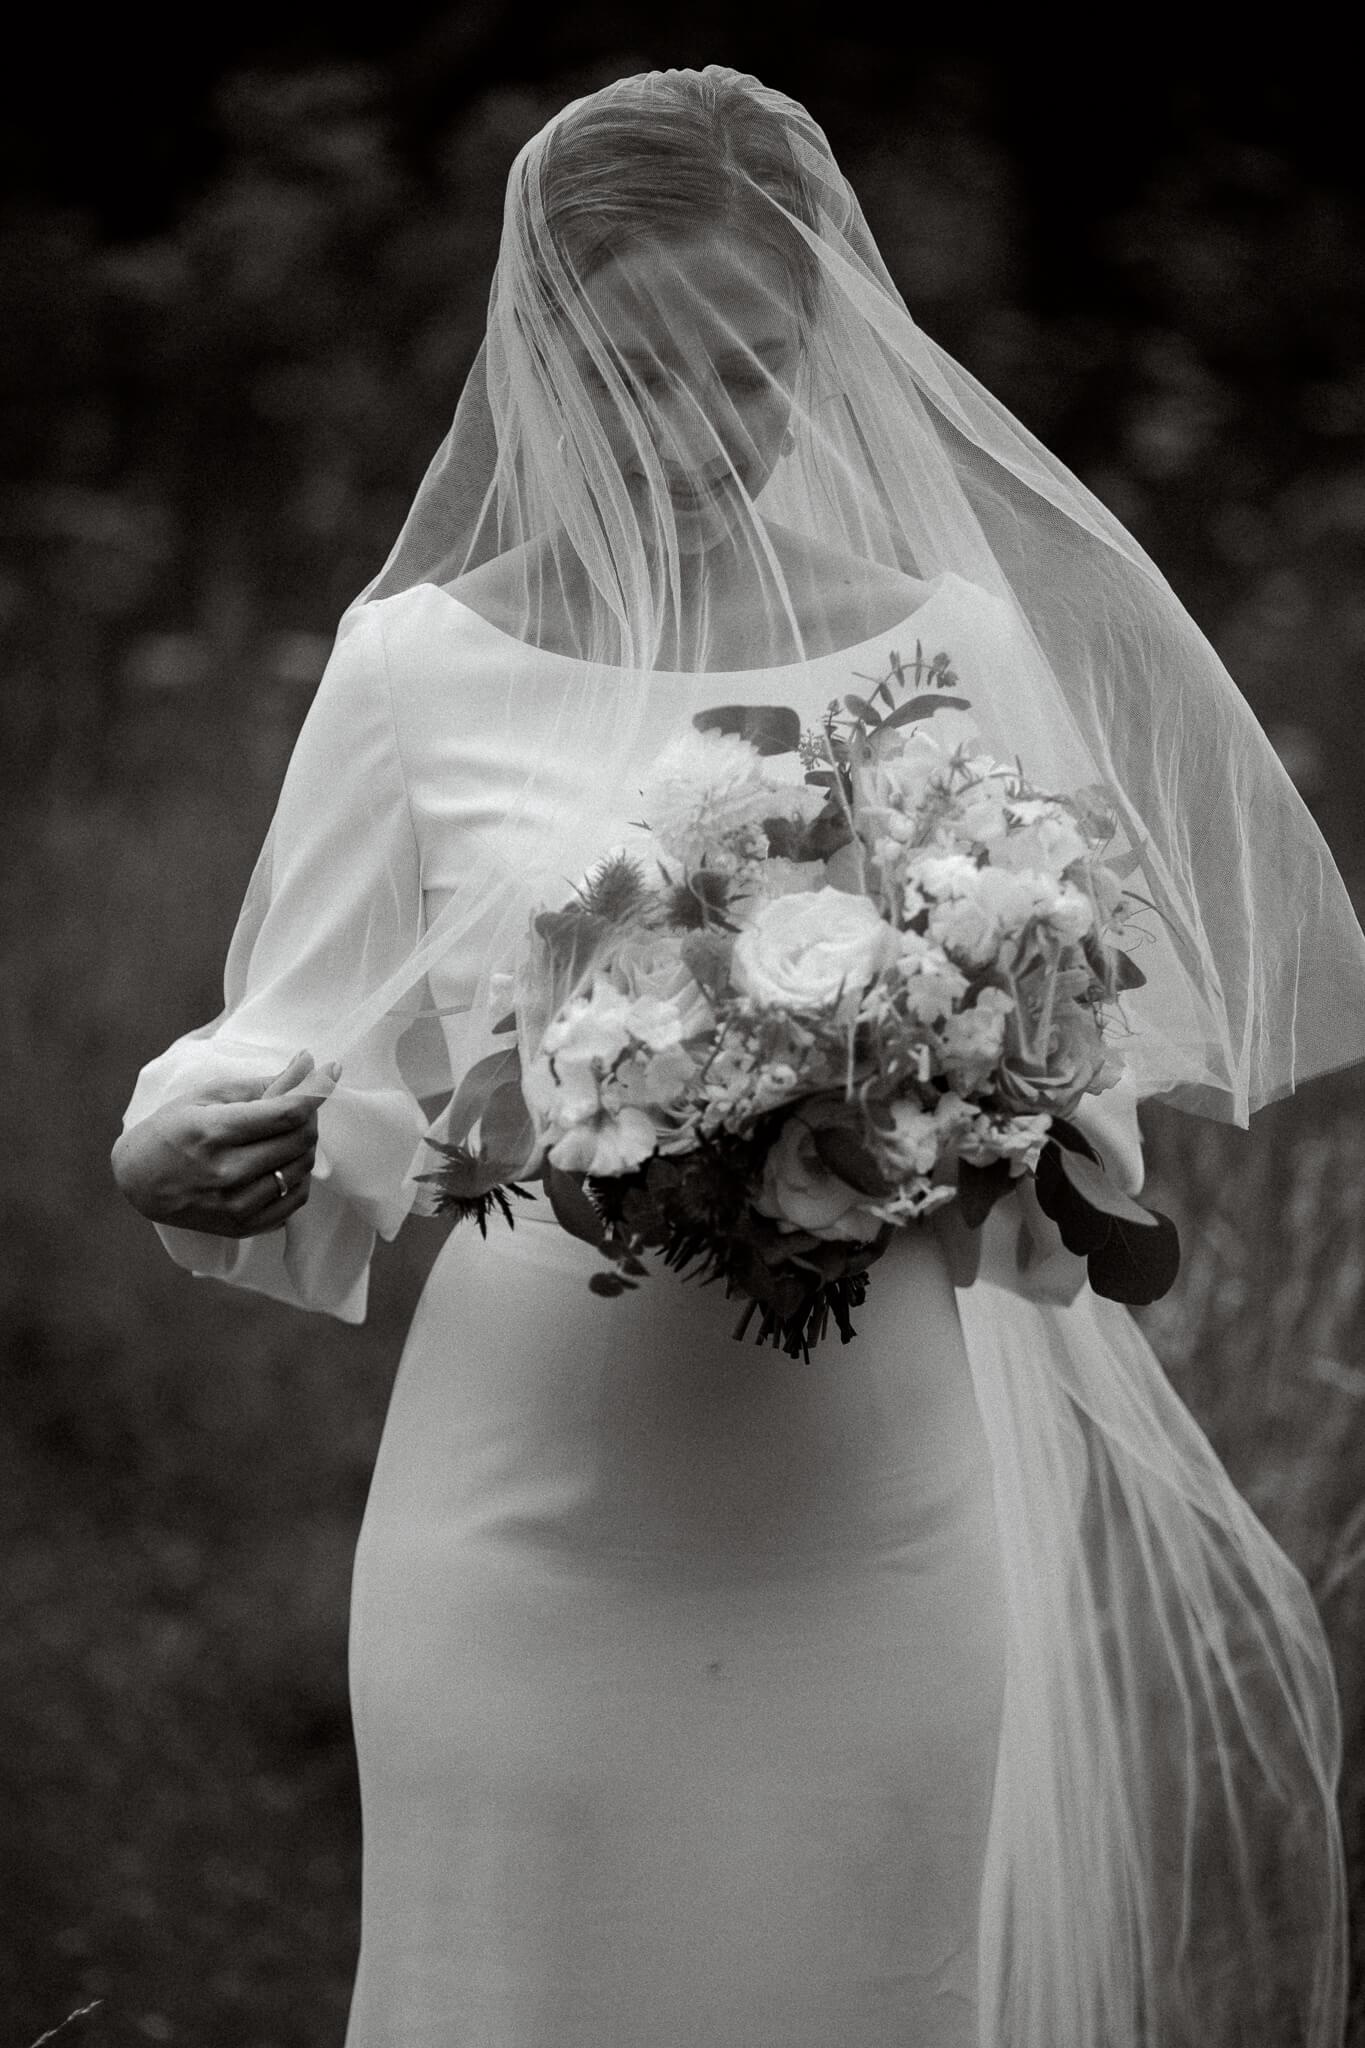 Lains Barn wedding photography of Bride